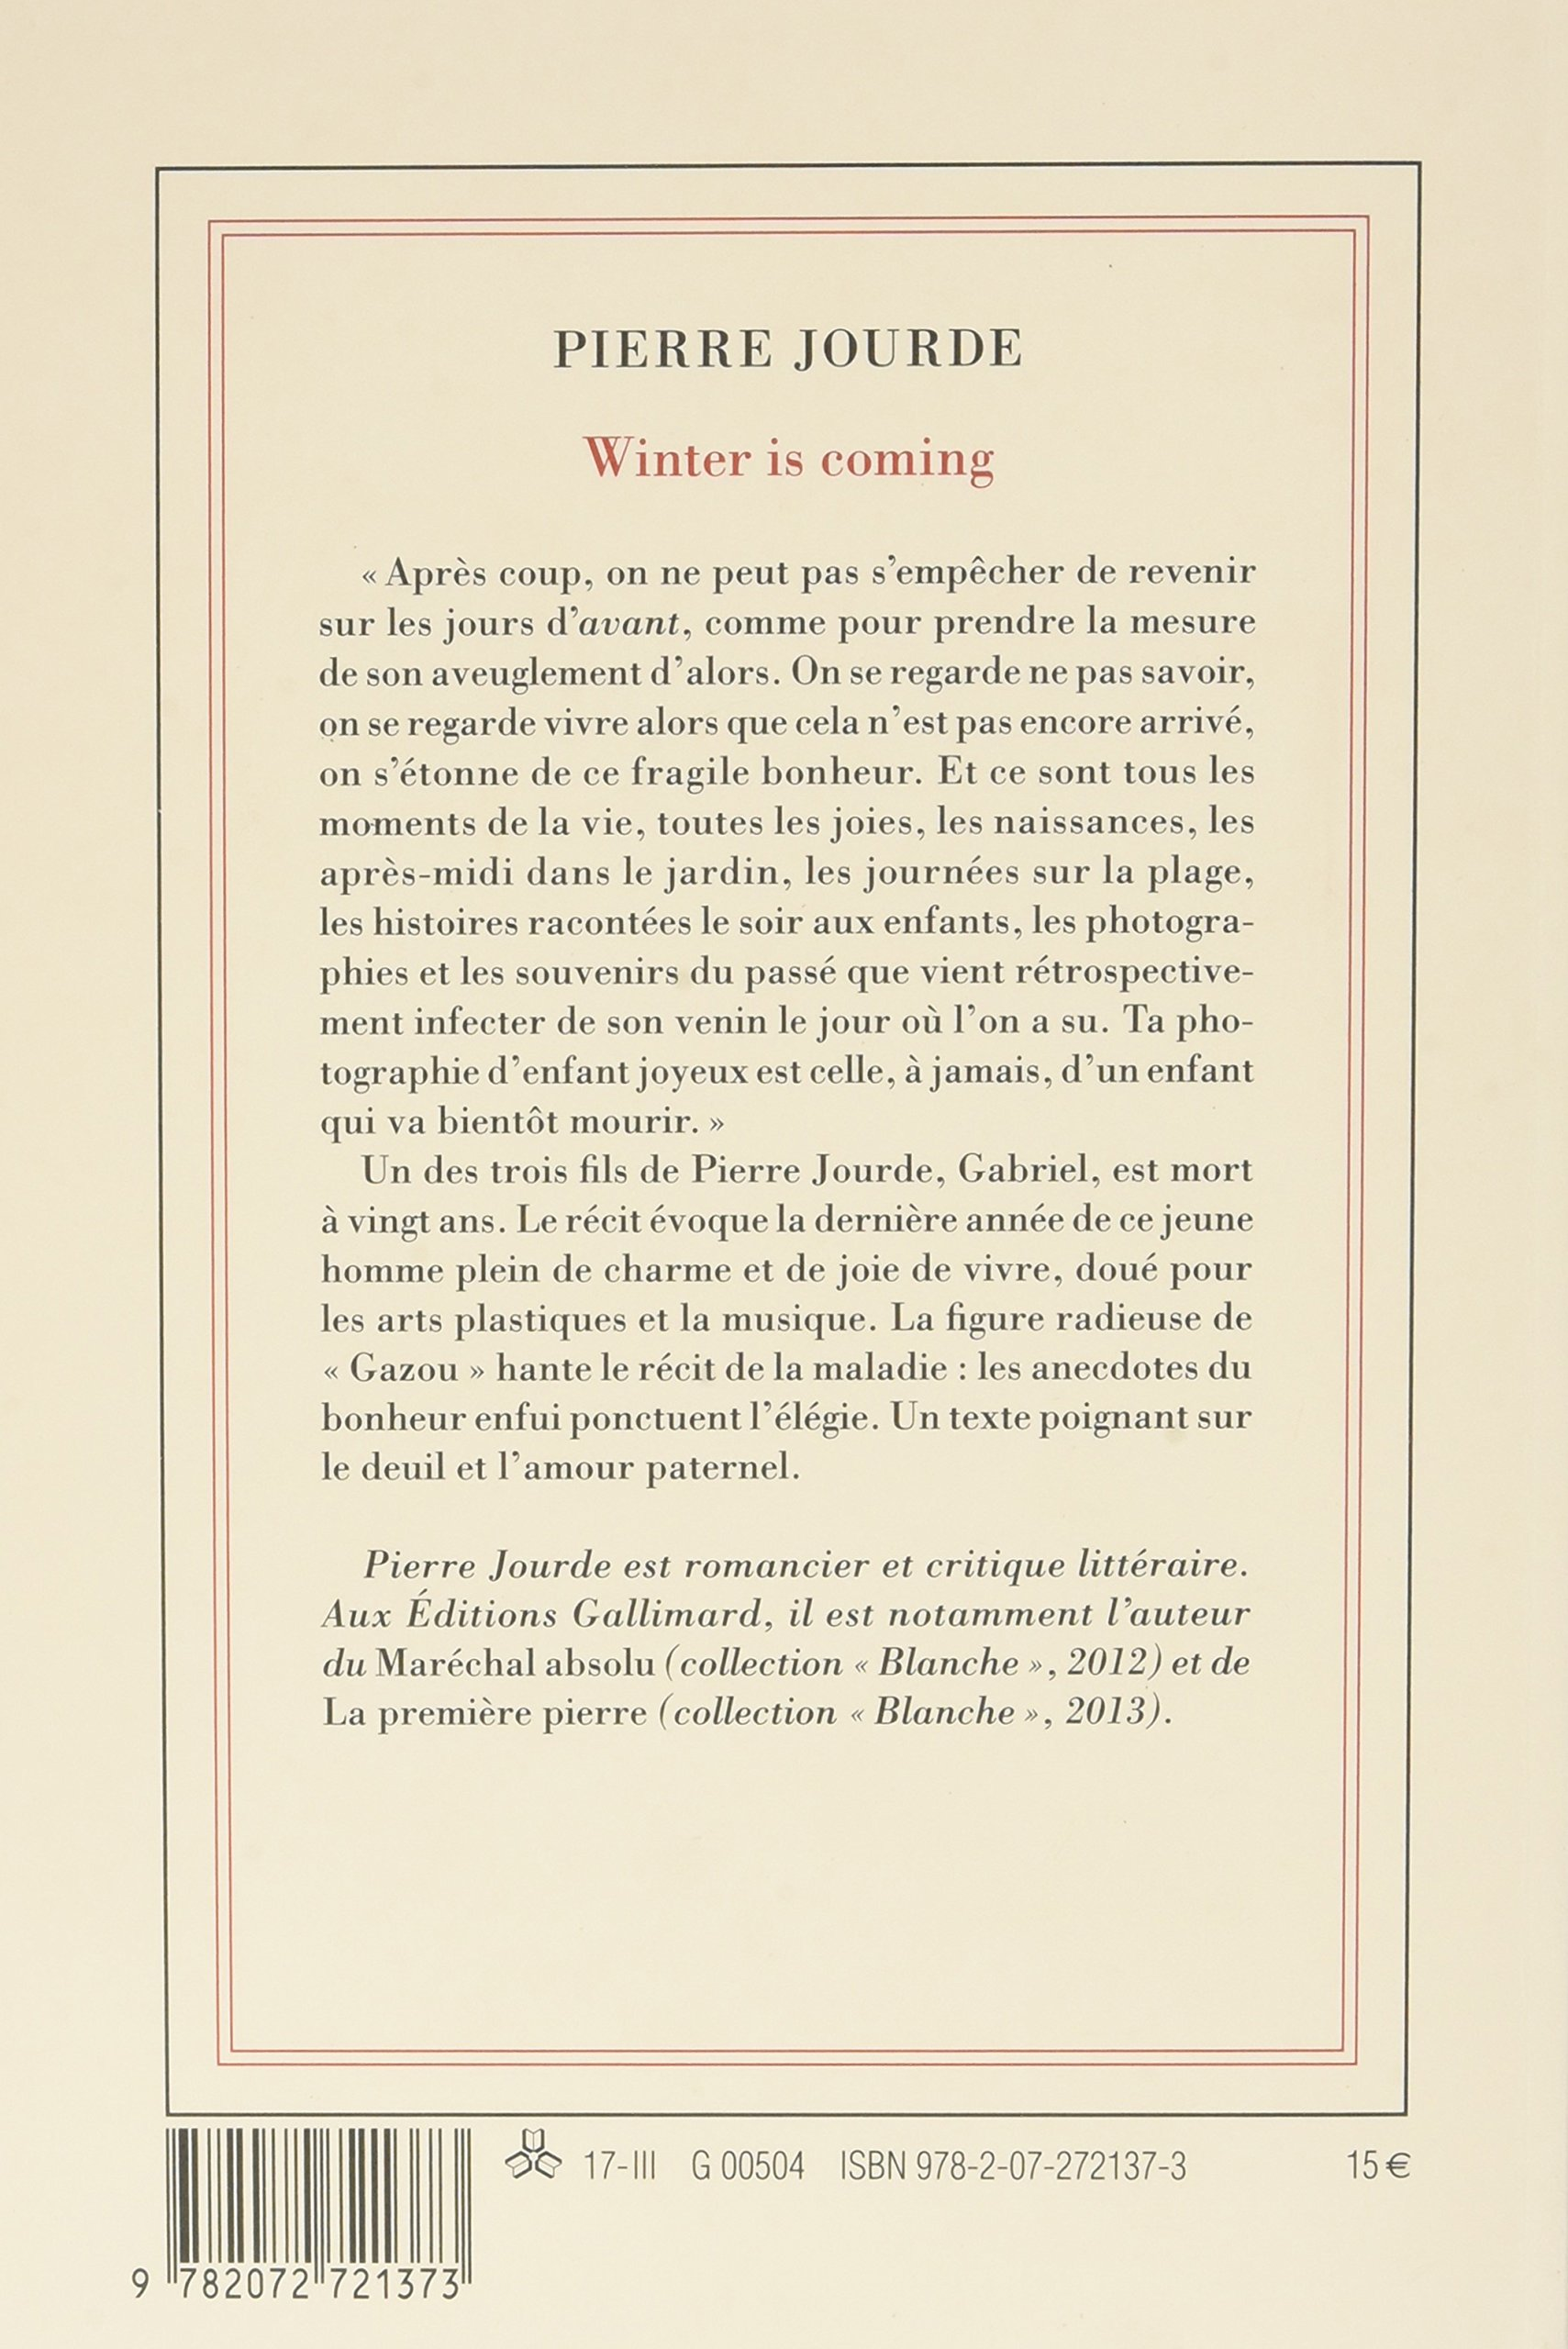 WinteriscomingIVcouverture